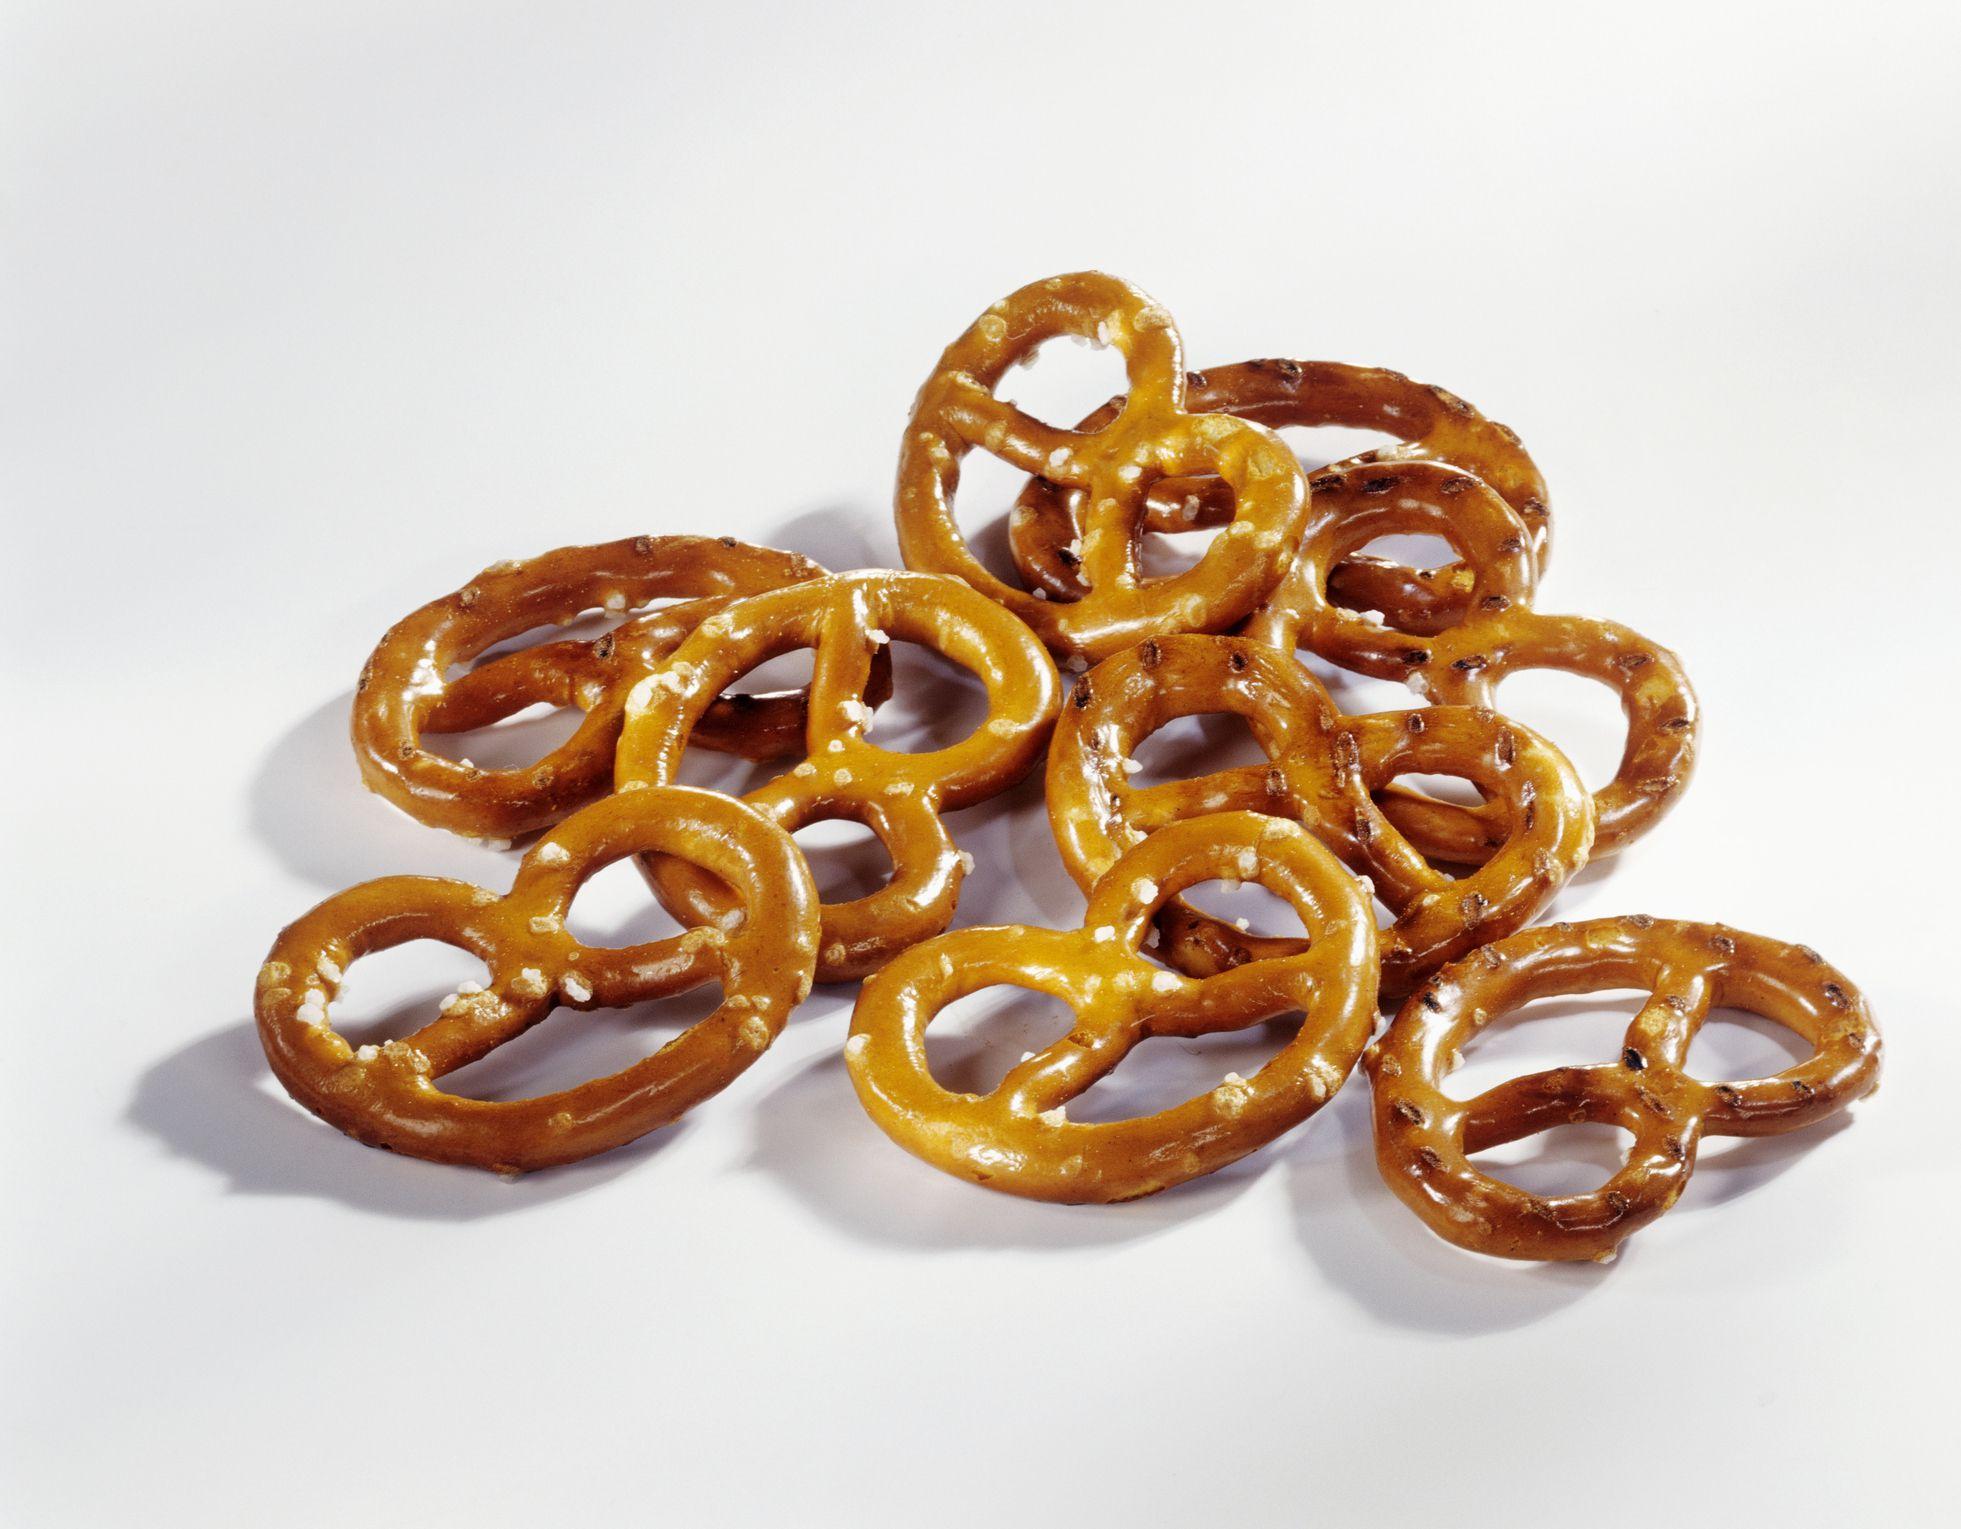 The 8 Best Gluten-Free Pretzels Brands to Buy in 2019